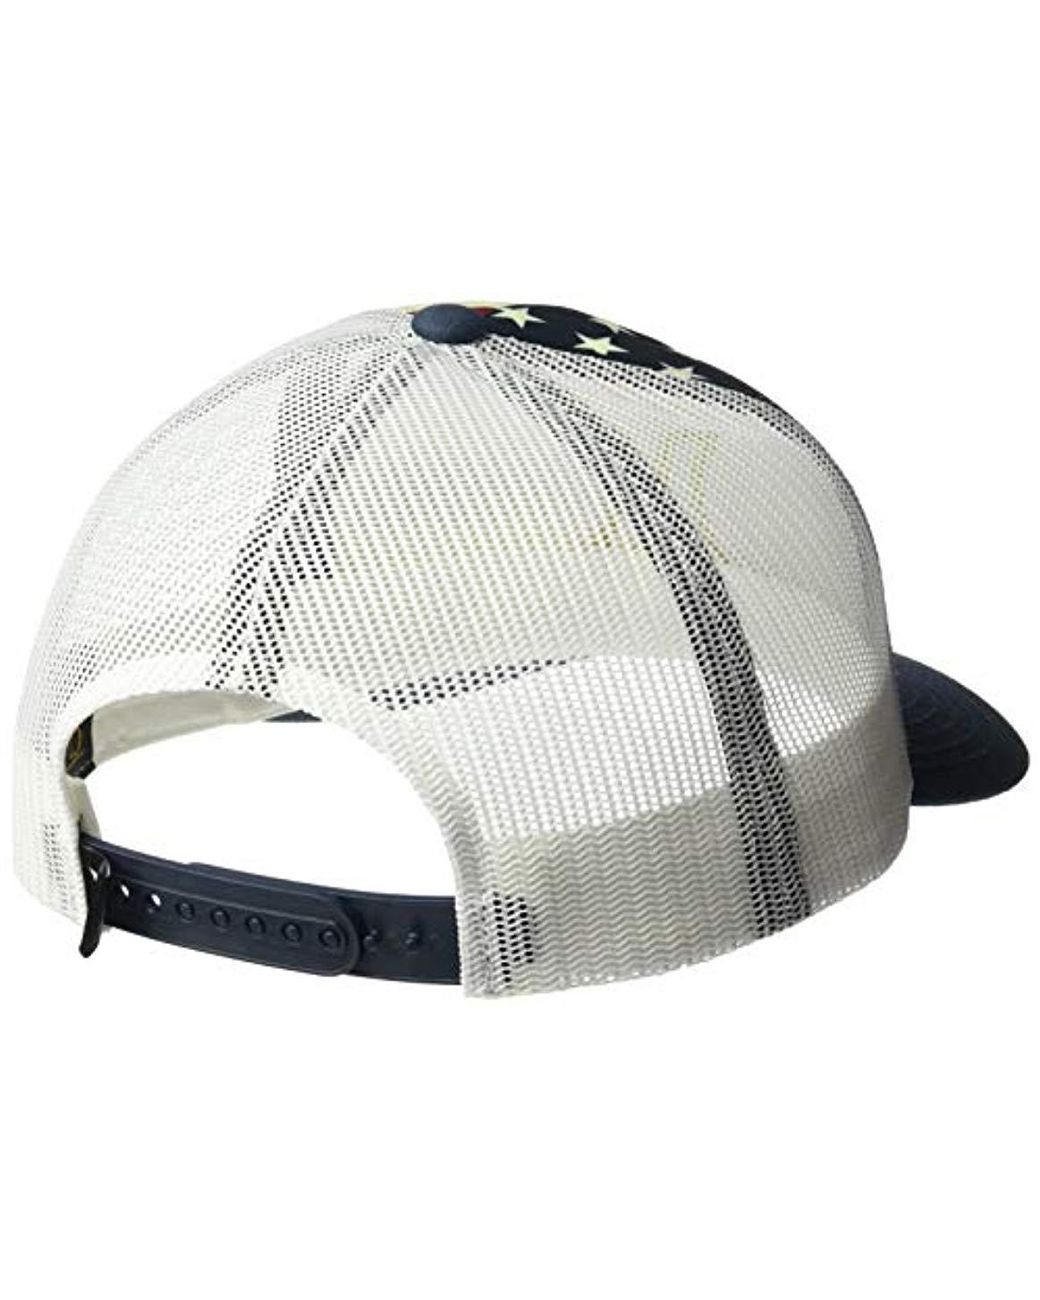 promo code ab435 4e014 Hurley Premium Usa Trucker Hat in White - Save 12% - Lyst